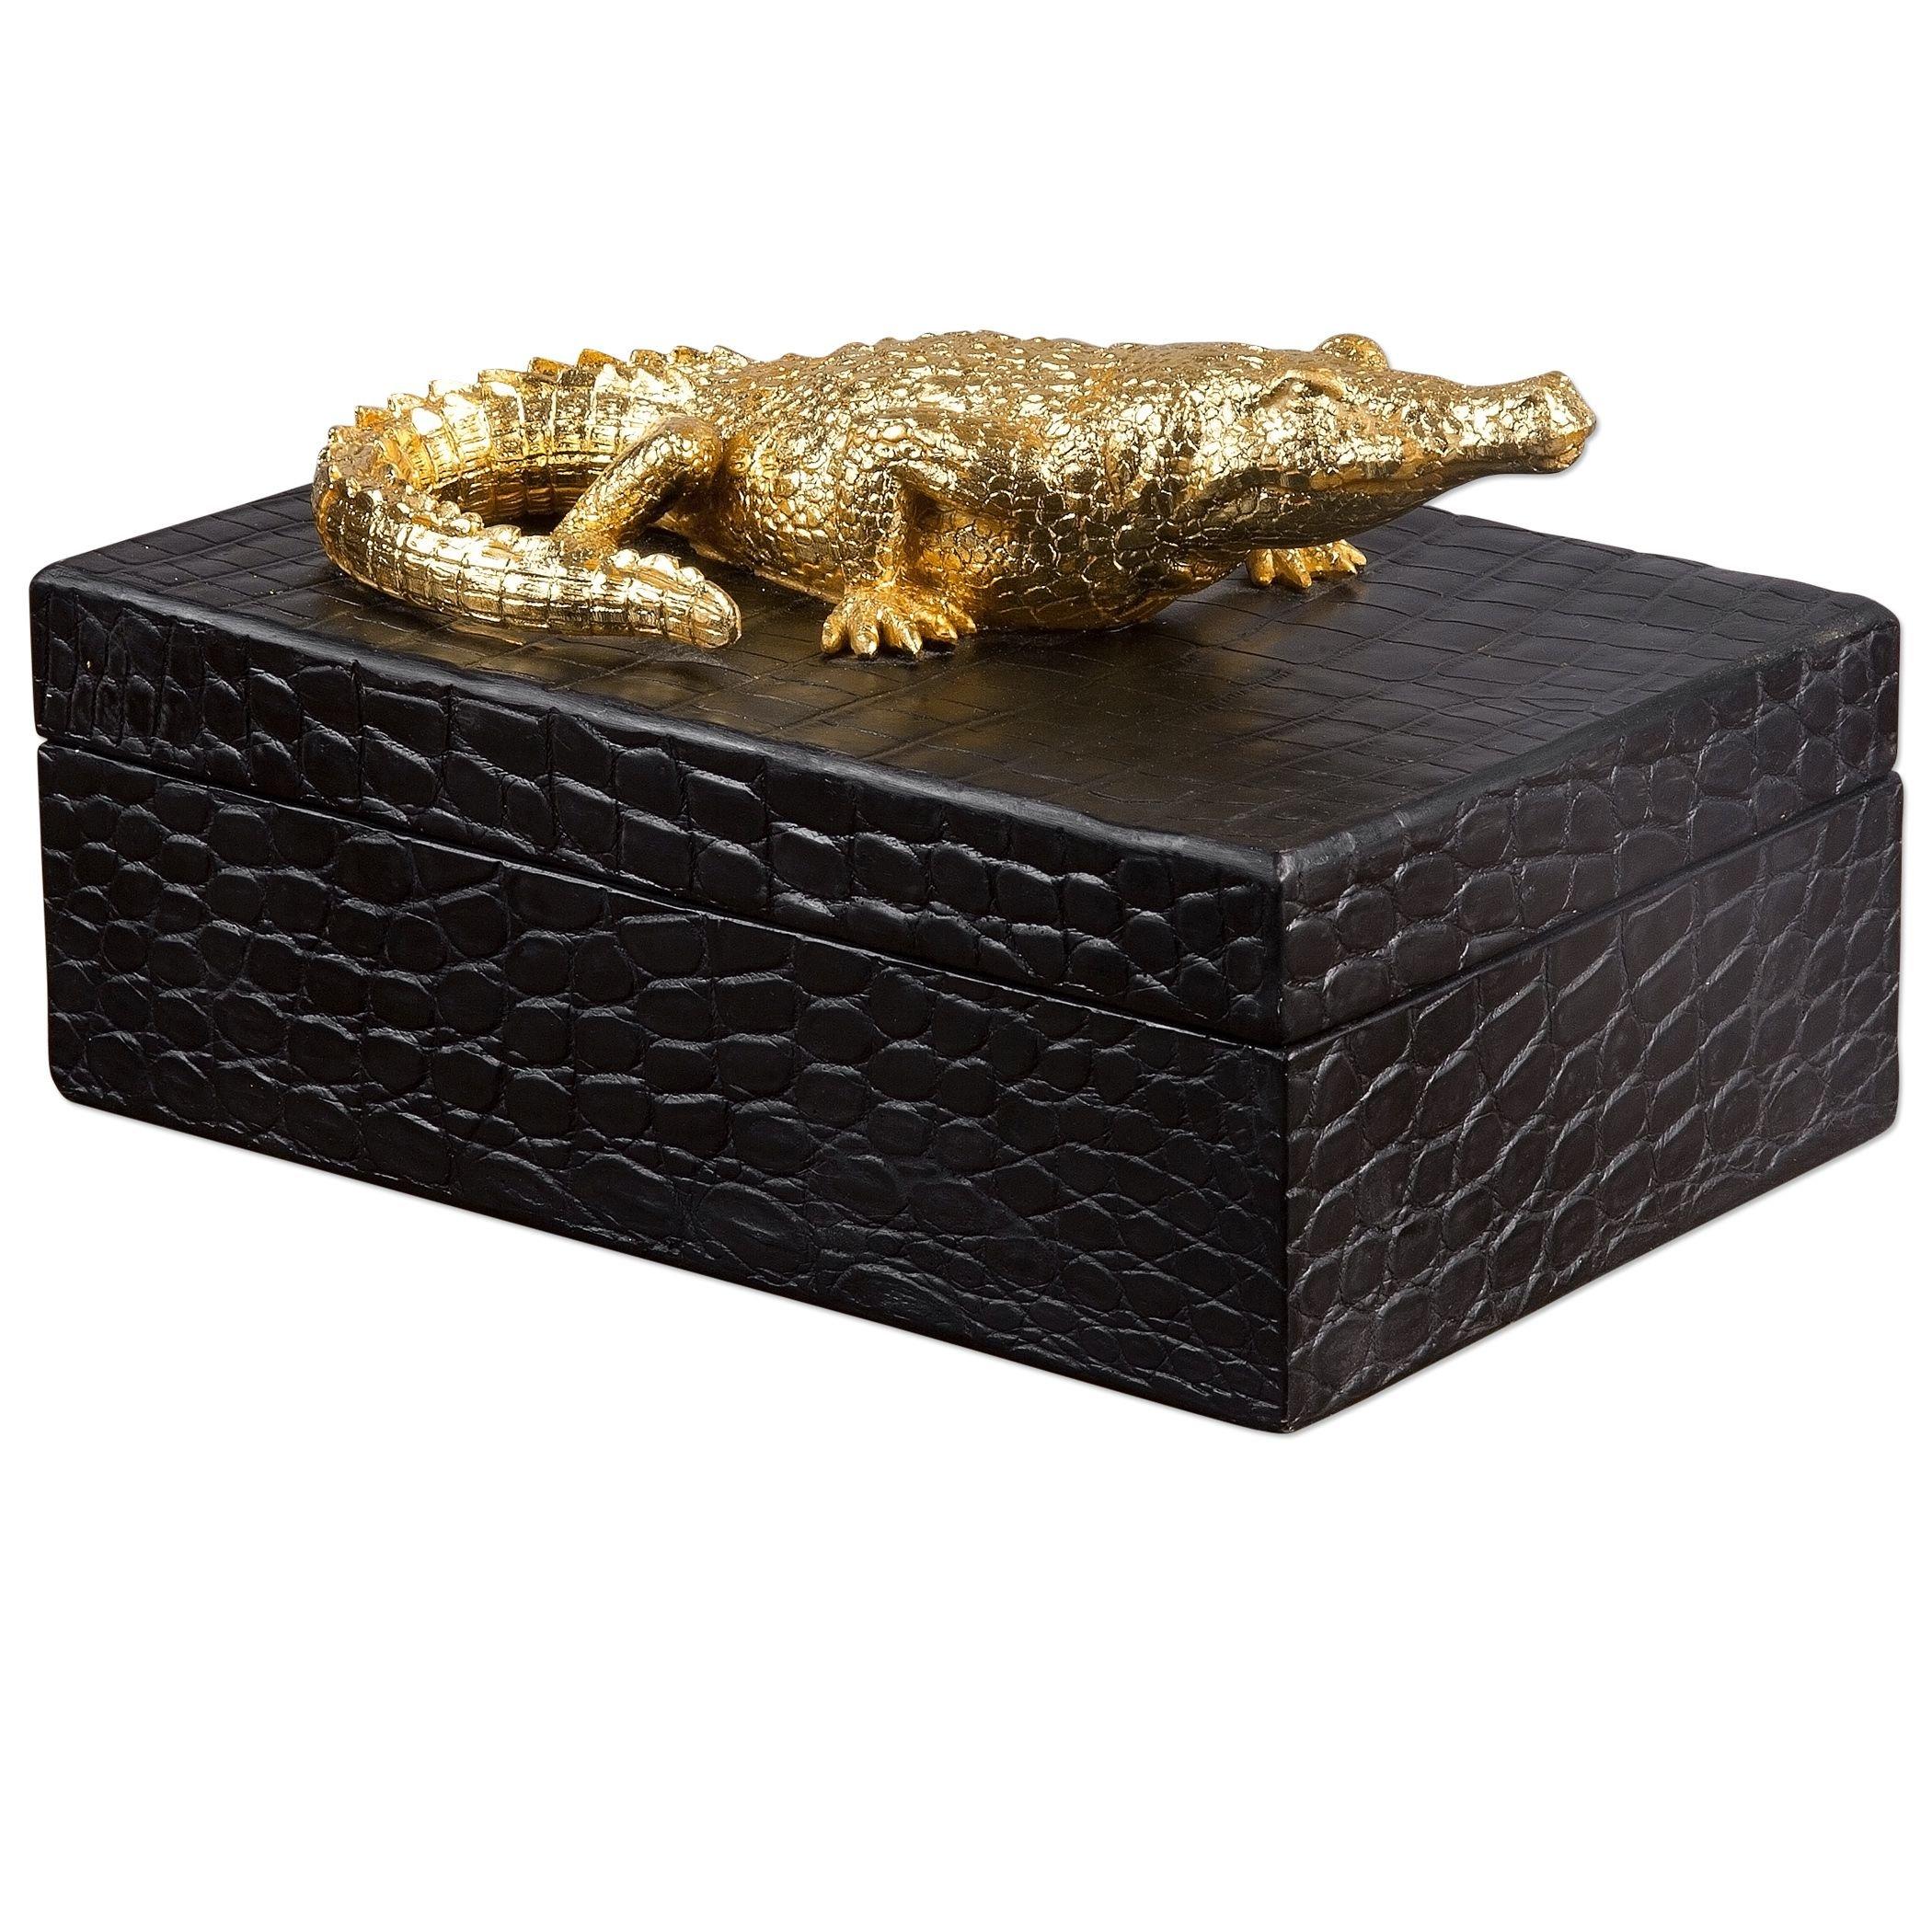 Elegant Gold Alligator Trinket Box   Crocodile Reptile Print Decor Black Skin by Uttermost